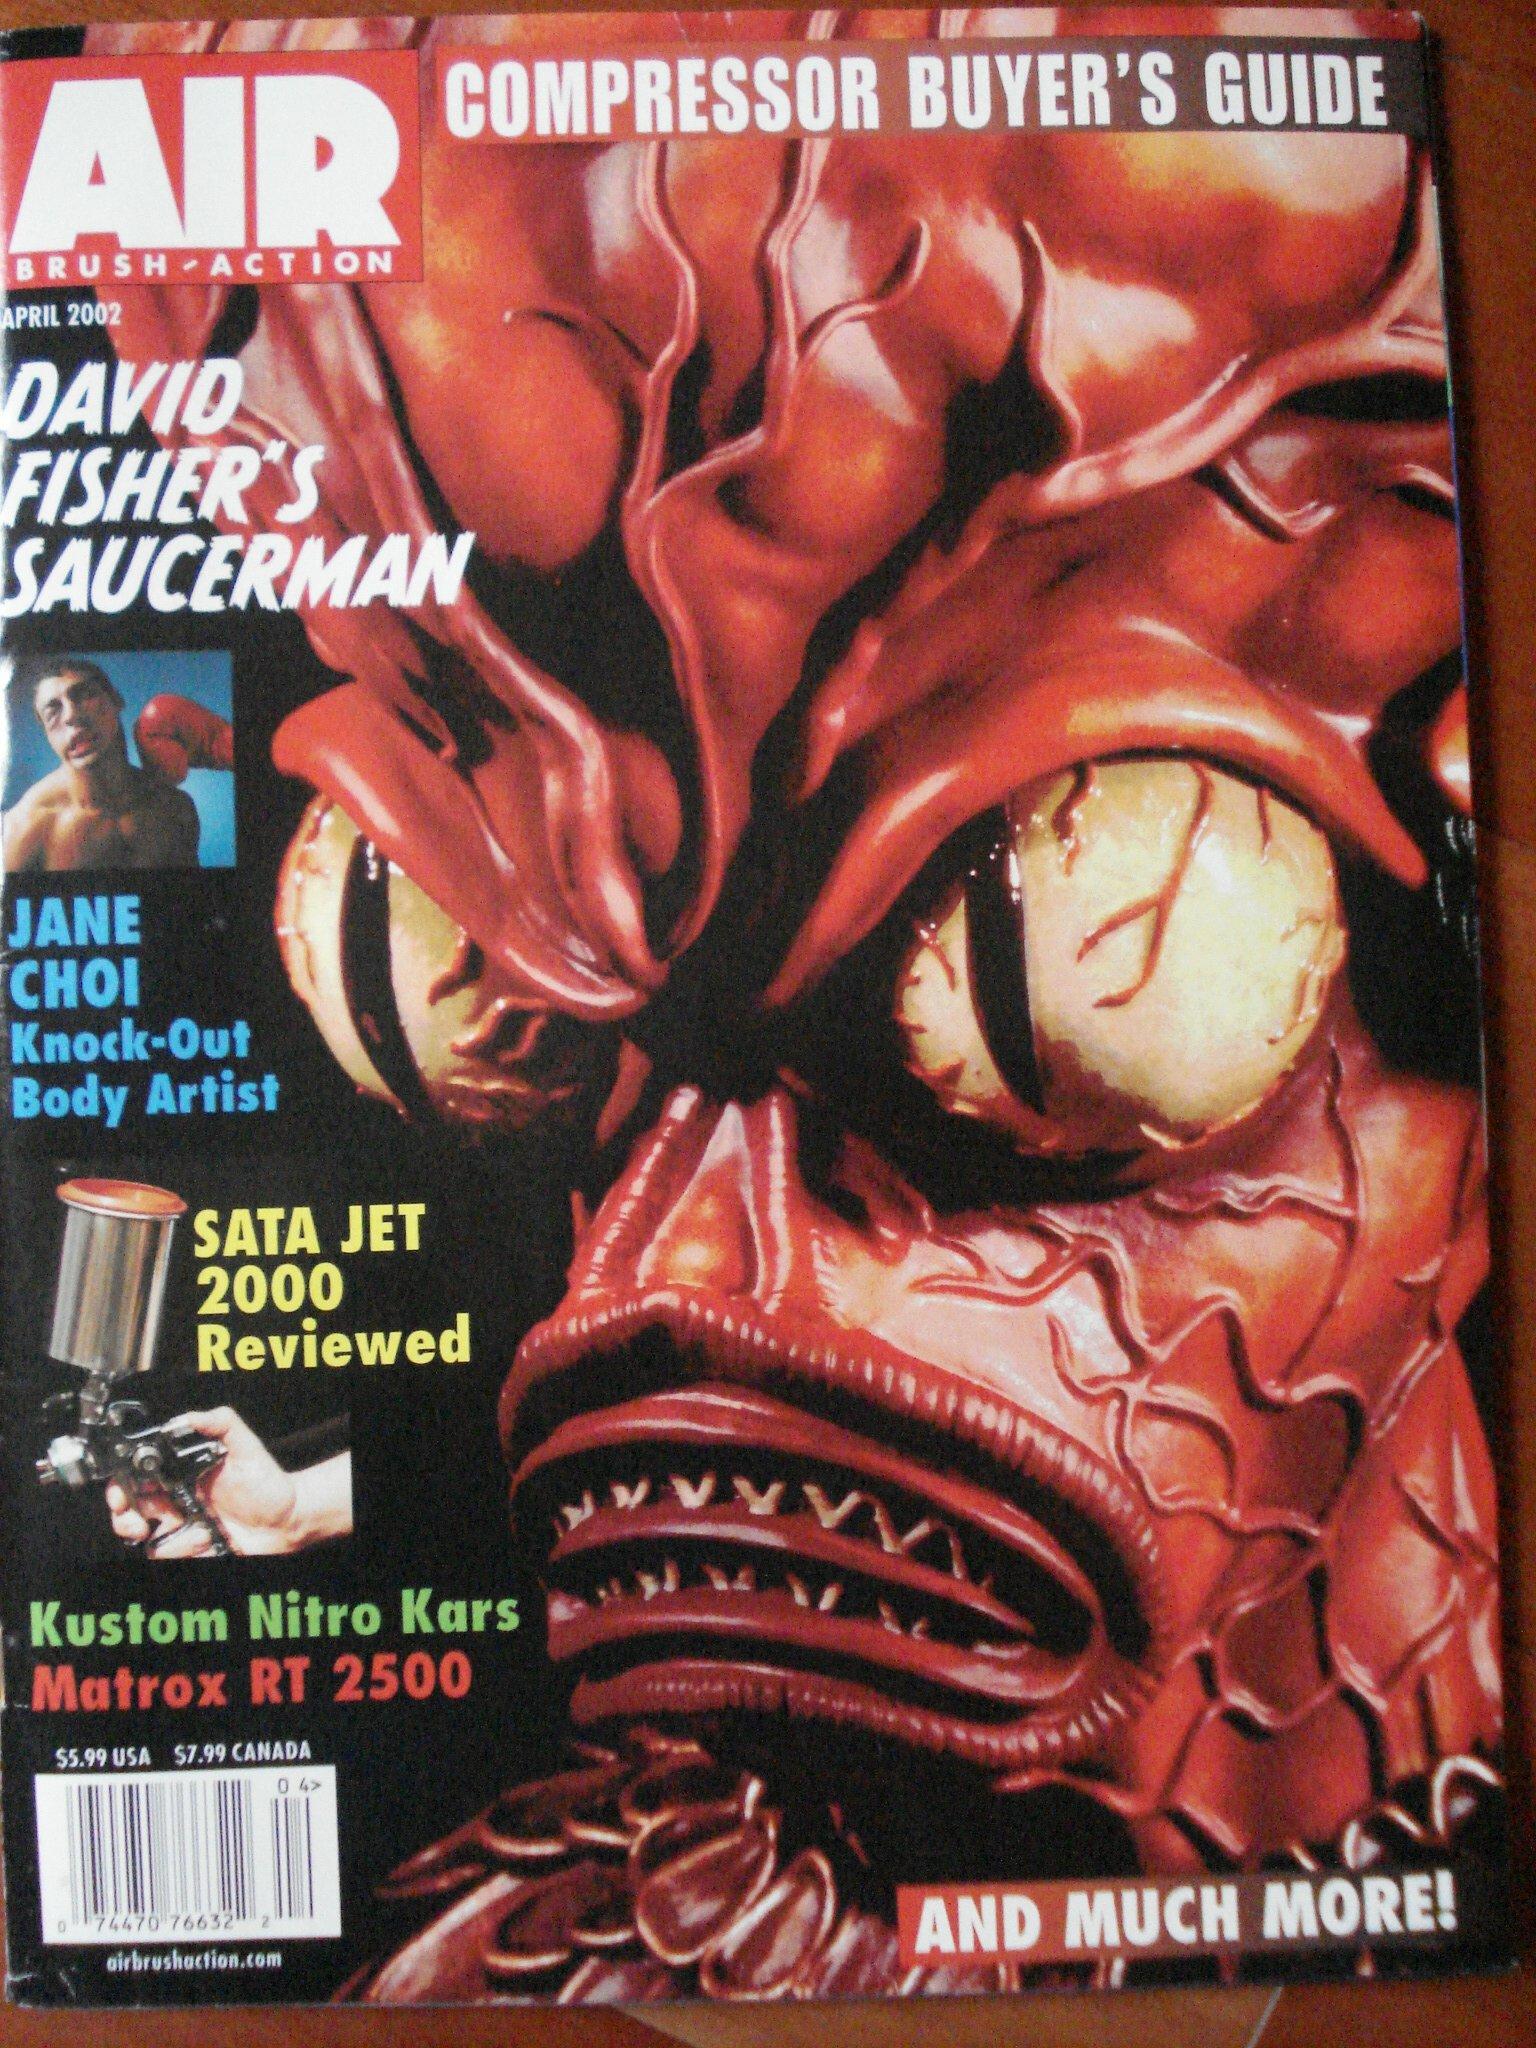 Airbrush Action Magazine - April 2002 (Volume 17, Number 6) PDF